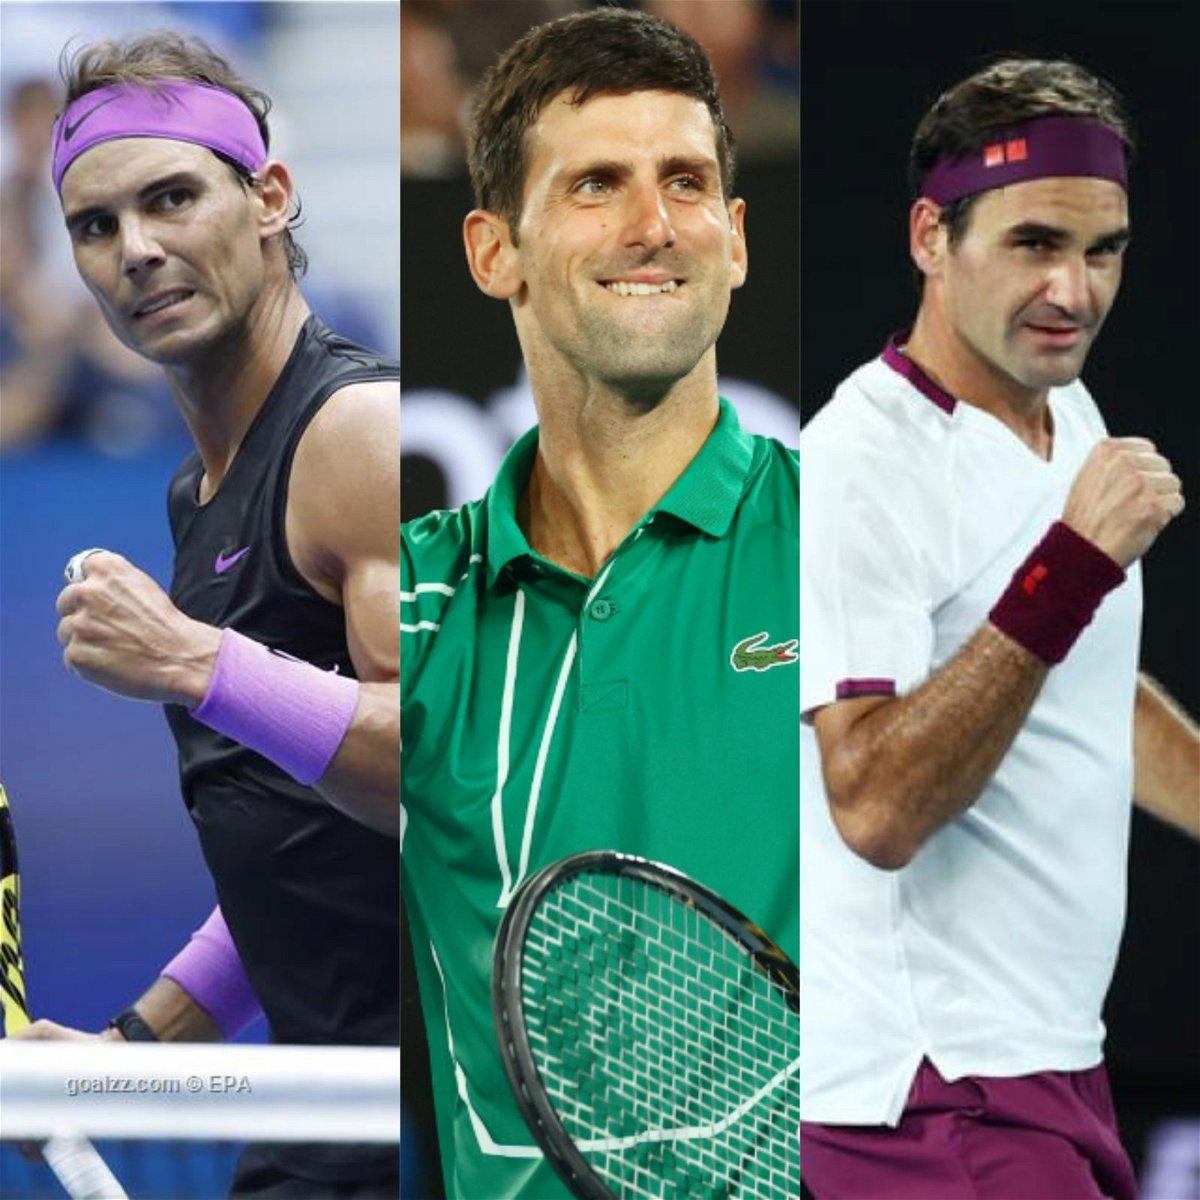 Watch Novak Djokovic Makes Interesting Choice Between Roger Federer And Rafael Nadal Essentiallysports